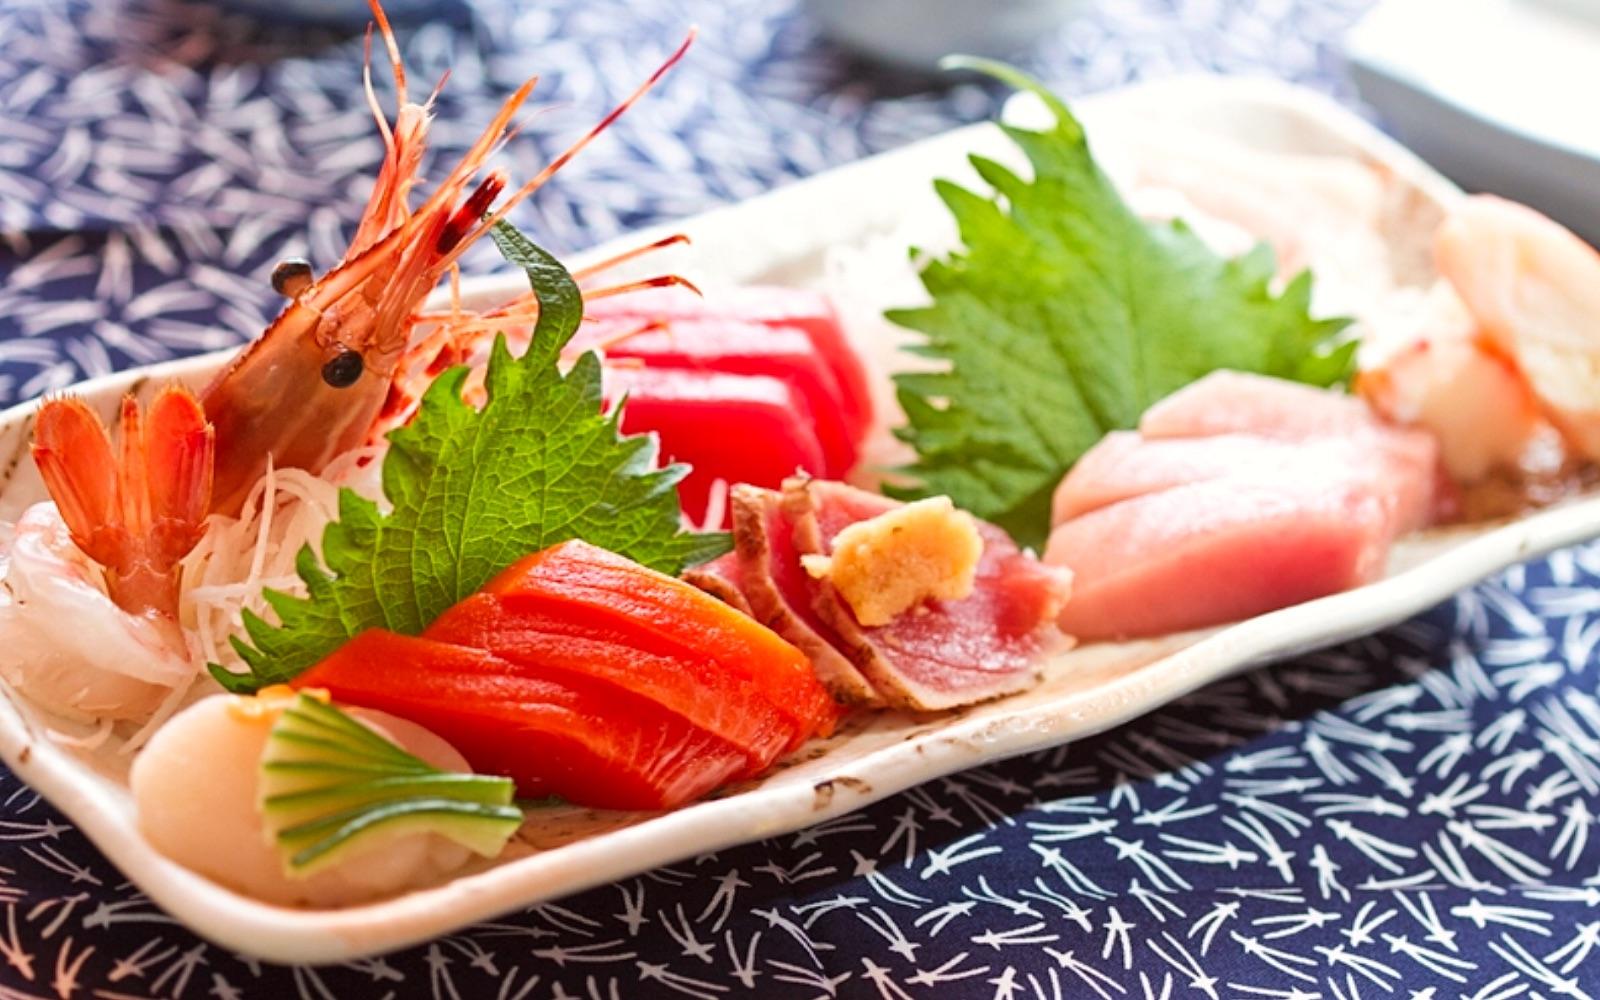 A sashimi platter at Sachi Sushi